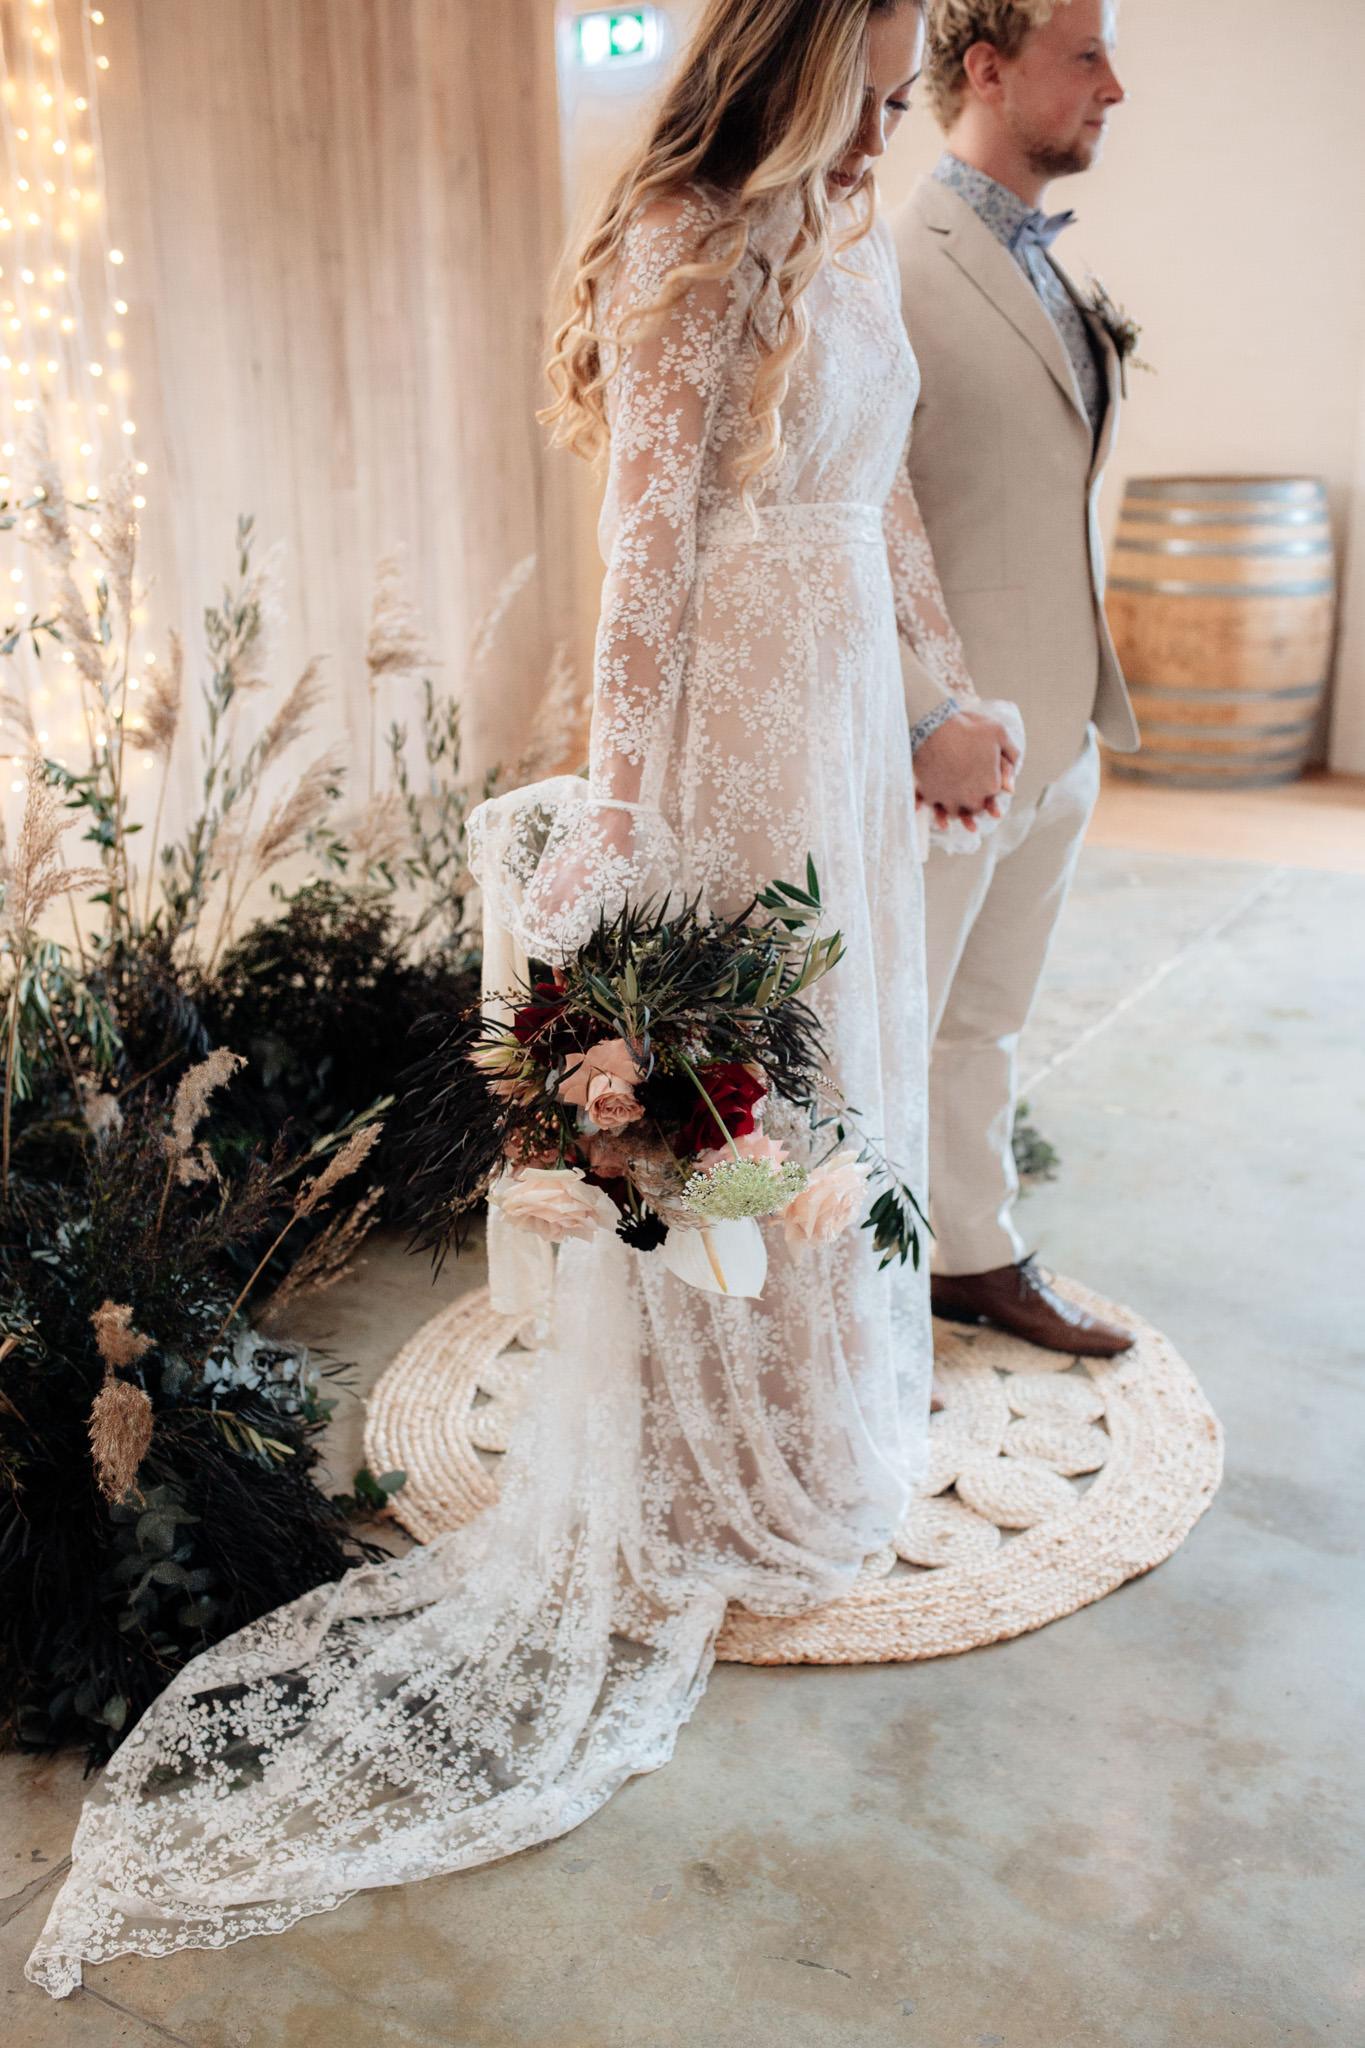 Aster and Rose - Wedding Planner and Co-ordinator - Torquay, Geelong, Surfcoast - Summer Wedding-93.jpg